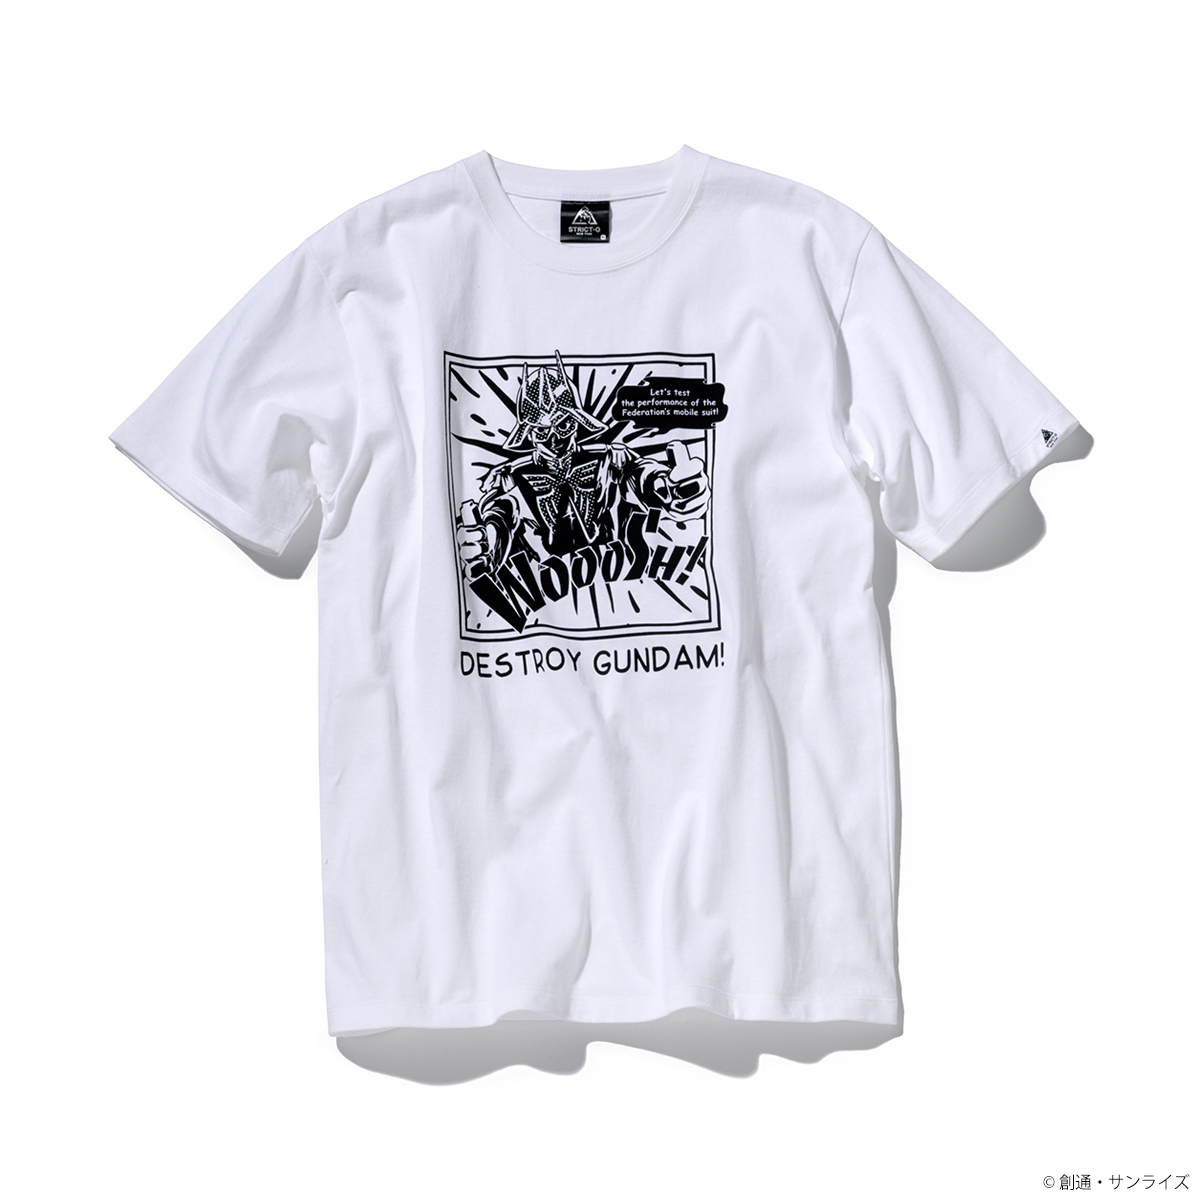 STRICT-G NEW YARK Tシャツ  DESTROY GUNDAM柄